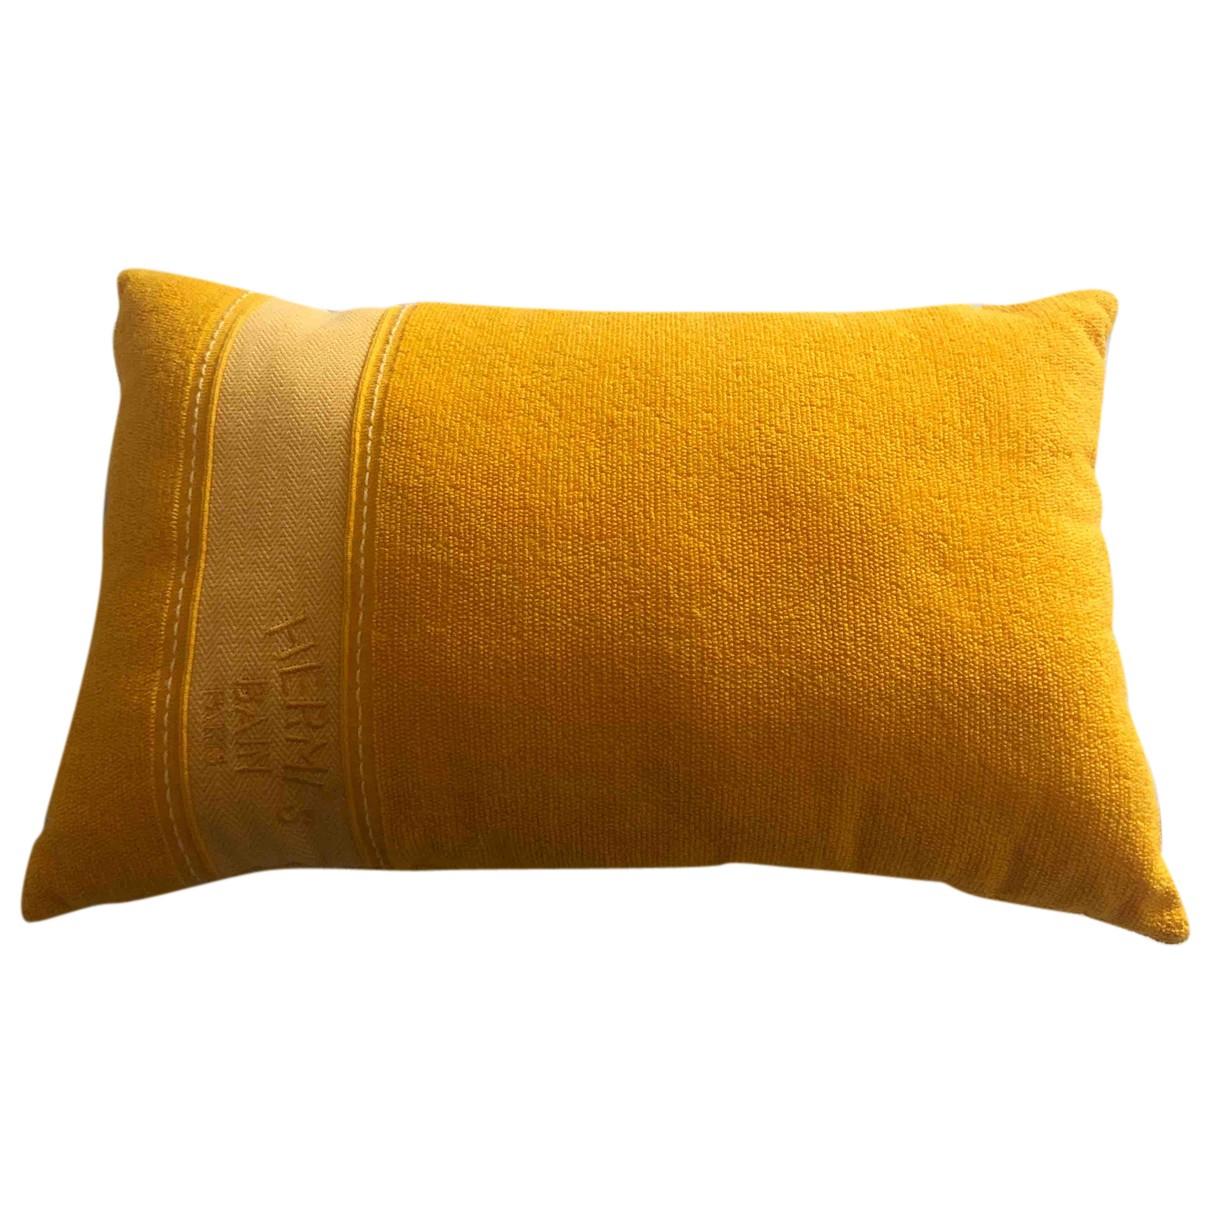 Hermes \N Heimtextilien in  Gelb Baumwolle